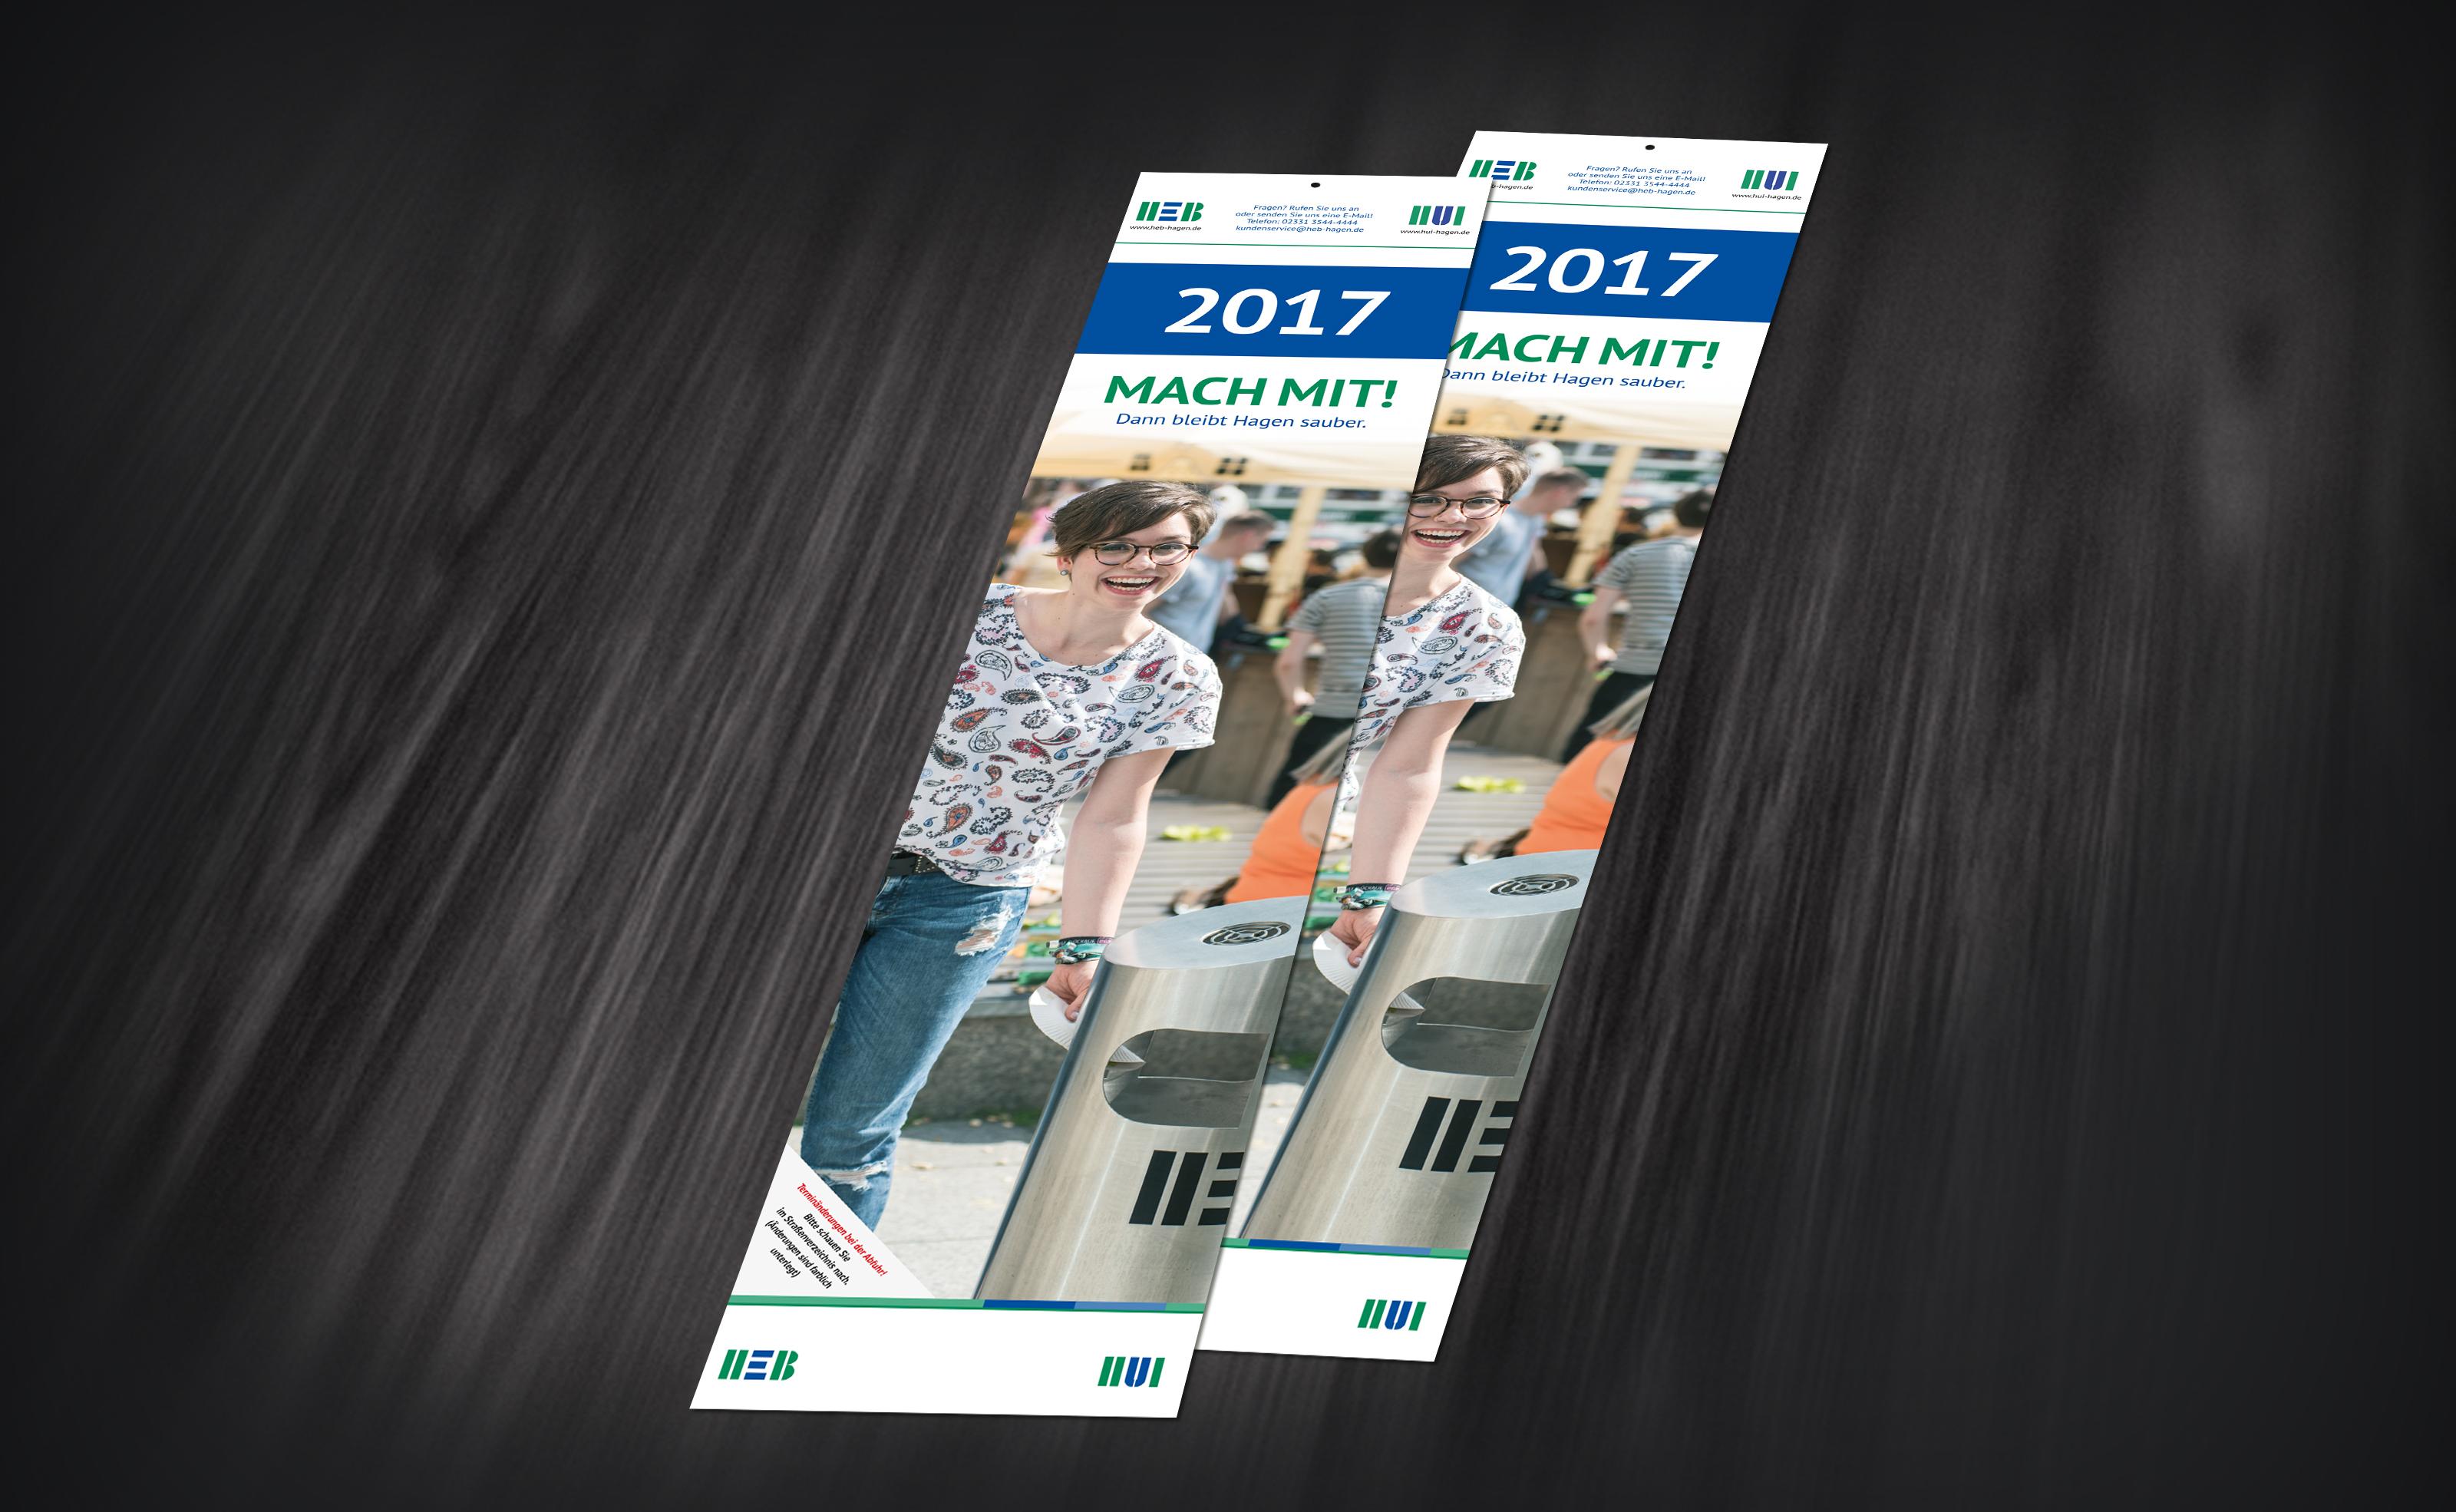 HEB-Abfuhrkalender 2017 THEMA: Stadtsauberkeit